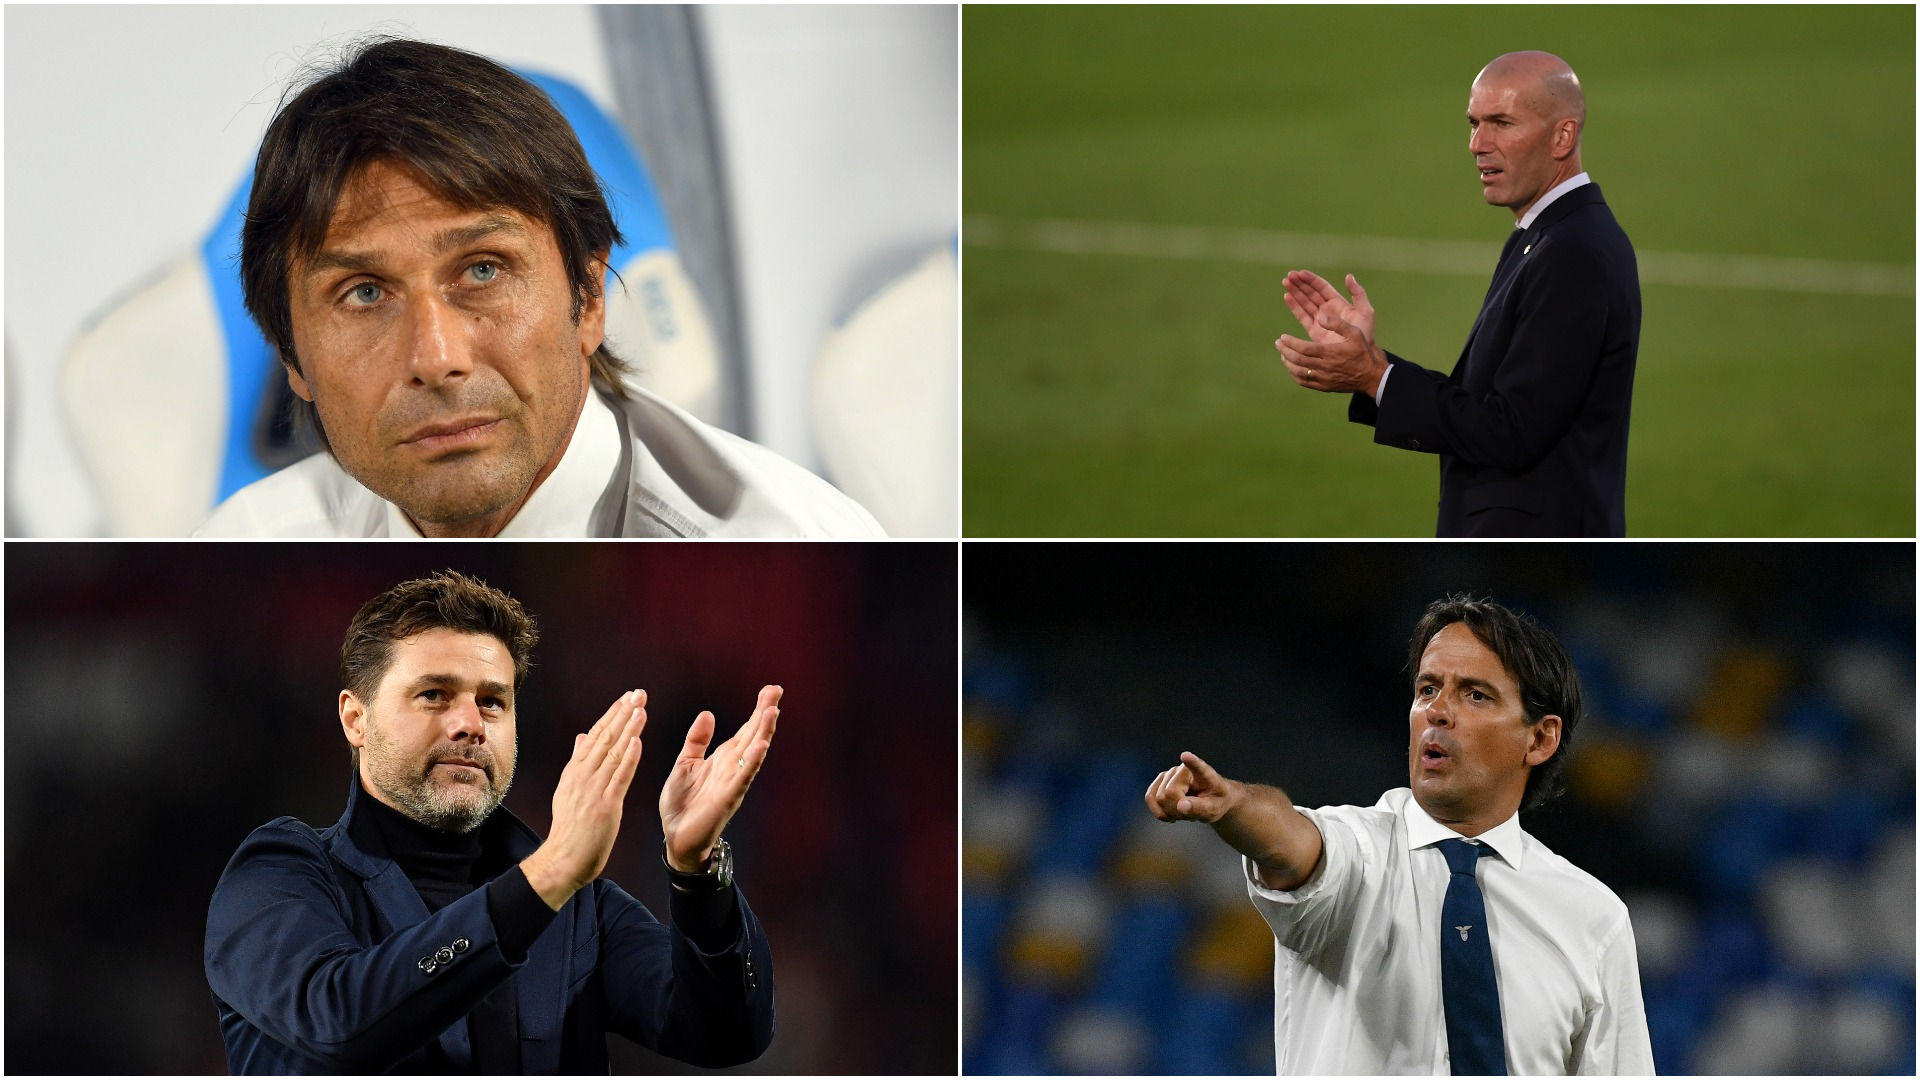 Juventus sack Sarri: Pochettino, Zidane and the contenders to take over at the Bianconeri